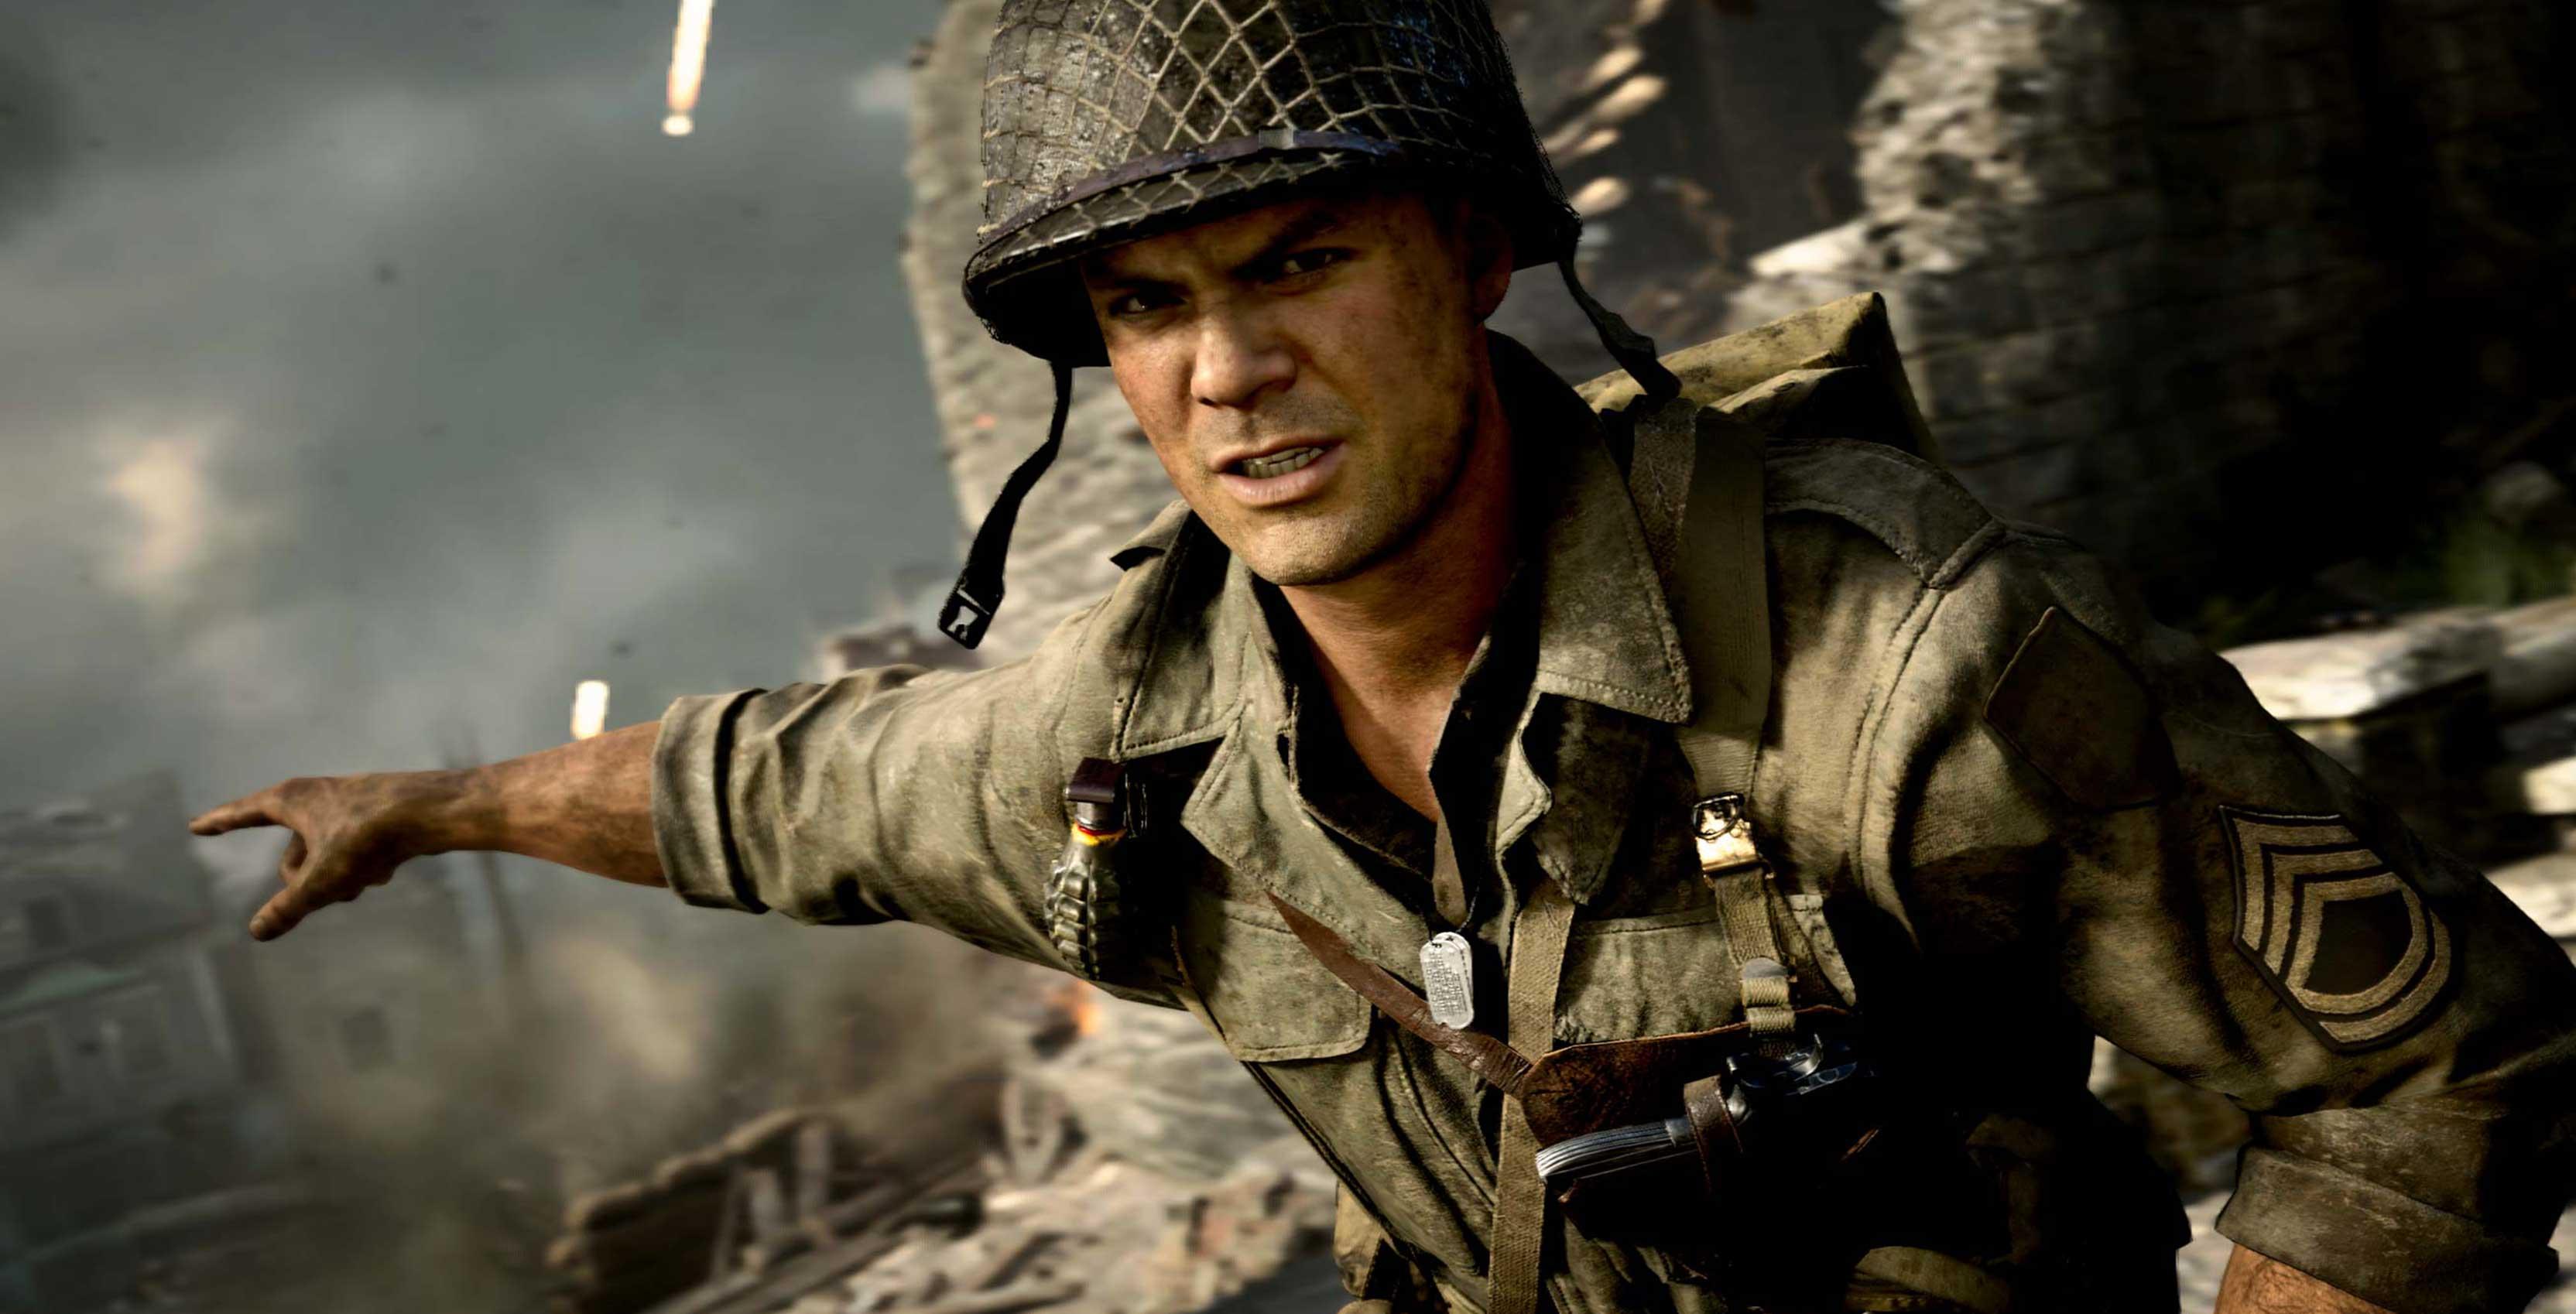 Call of Duty World War II soldier